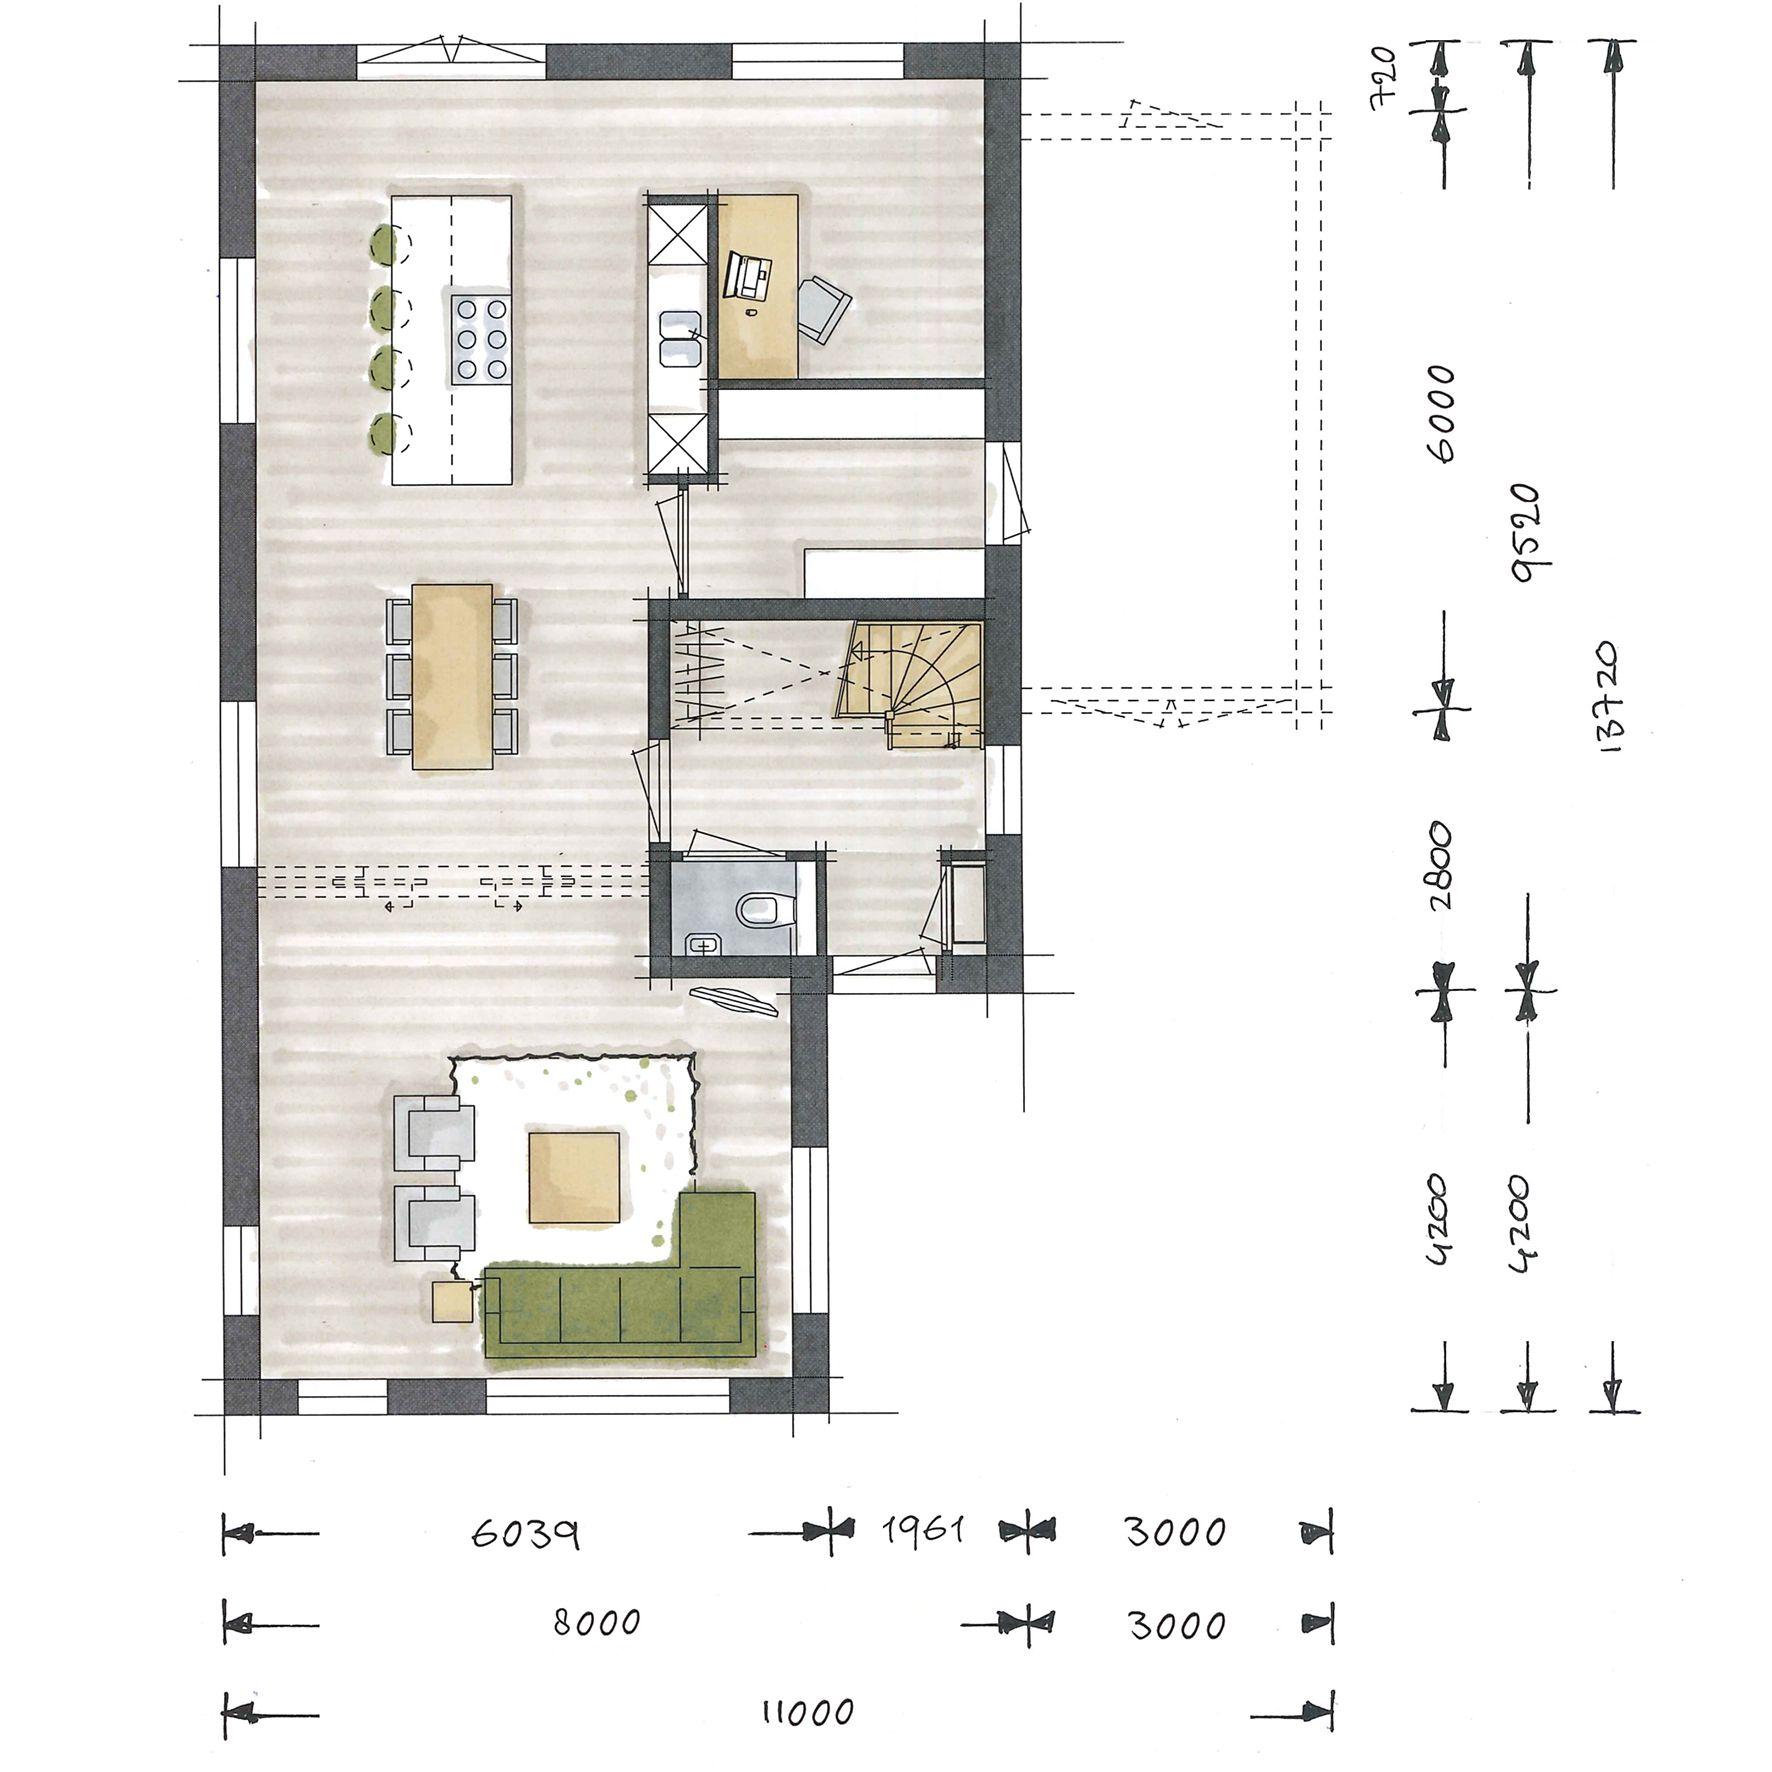 Villa bouwen aurelia plattegrond begane grond huizen for Plattegrond woning indeling